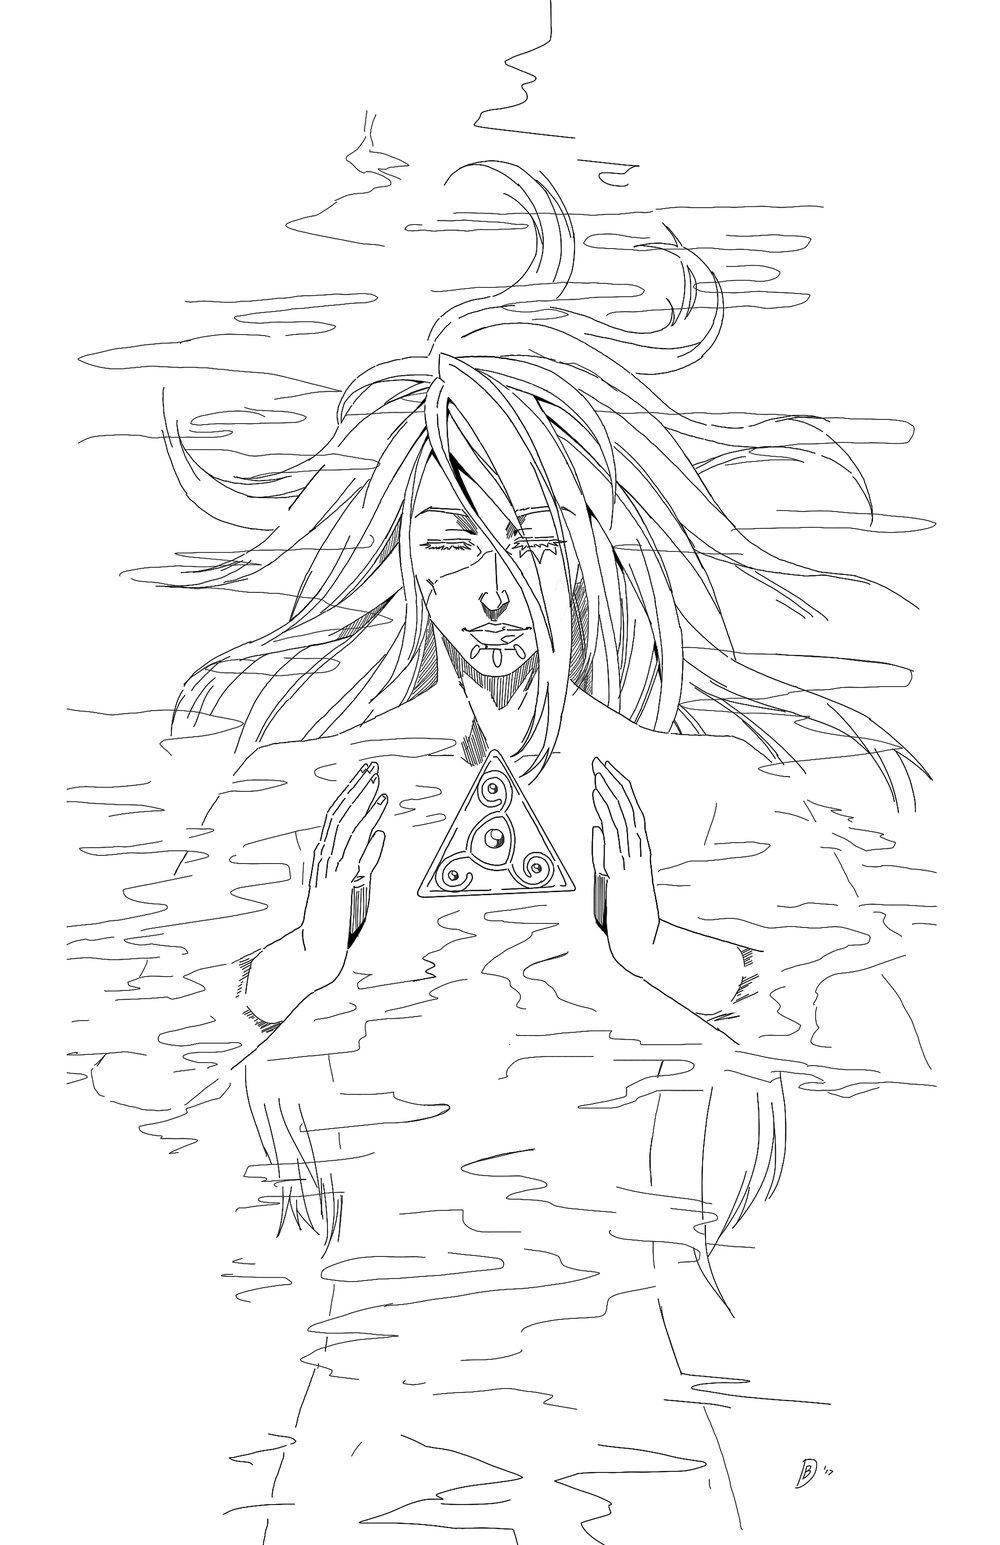 11x17-Majeir-Floating.jpg